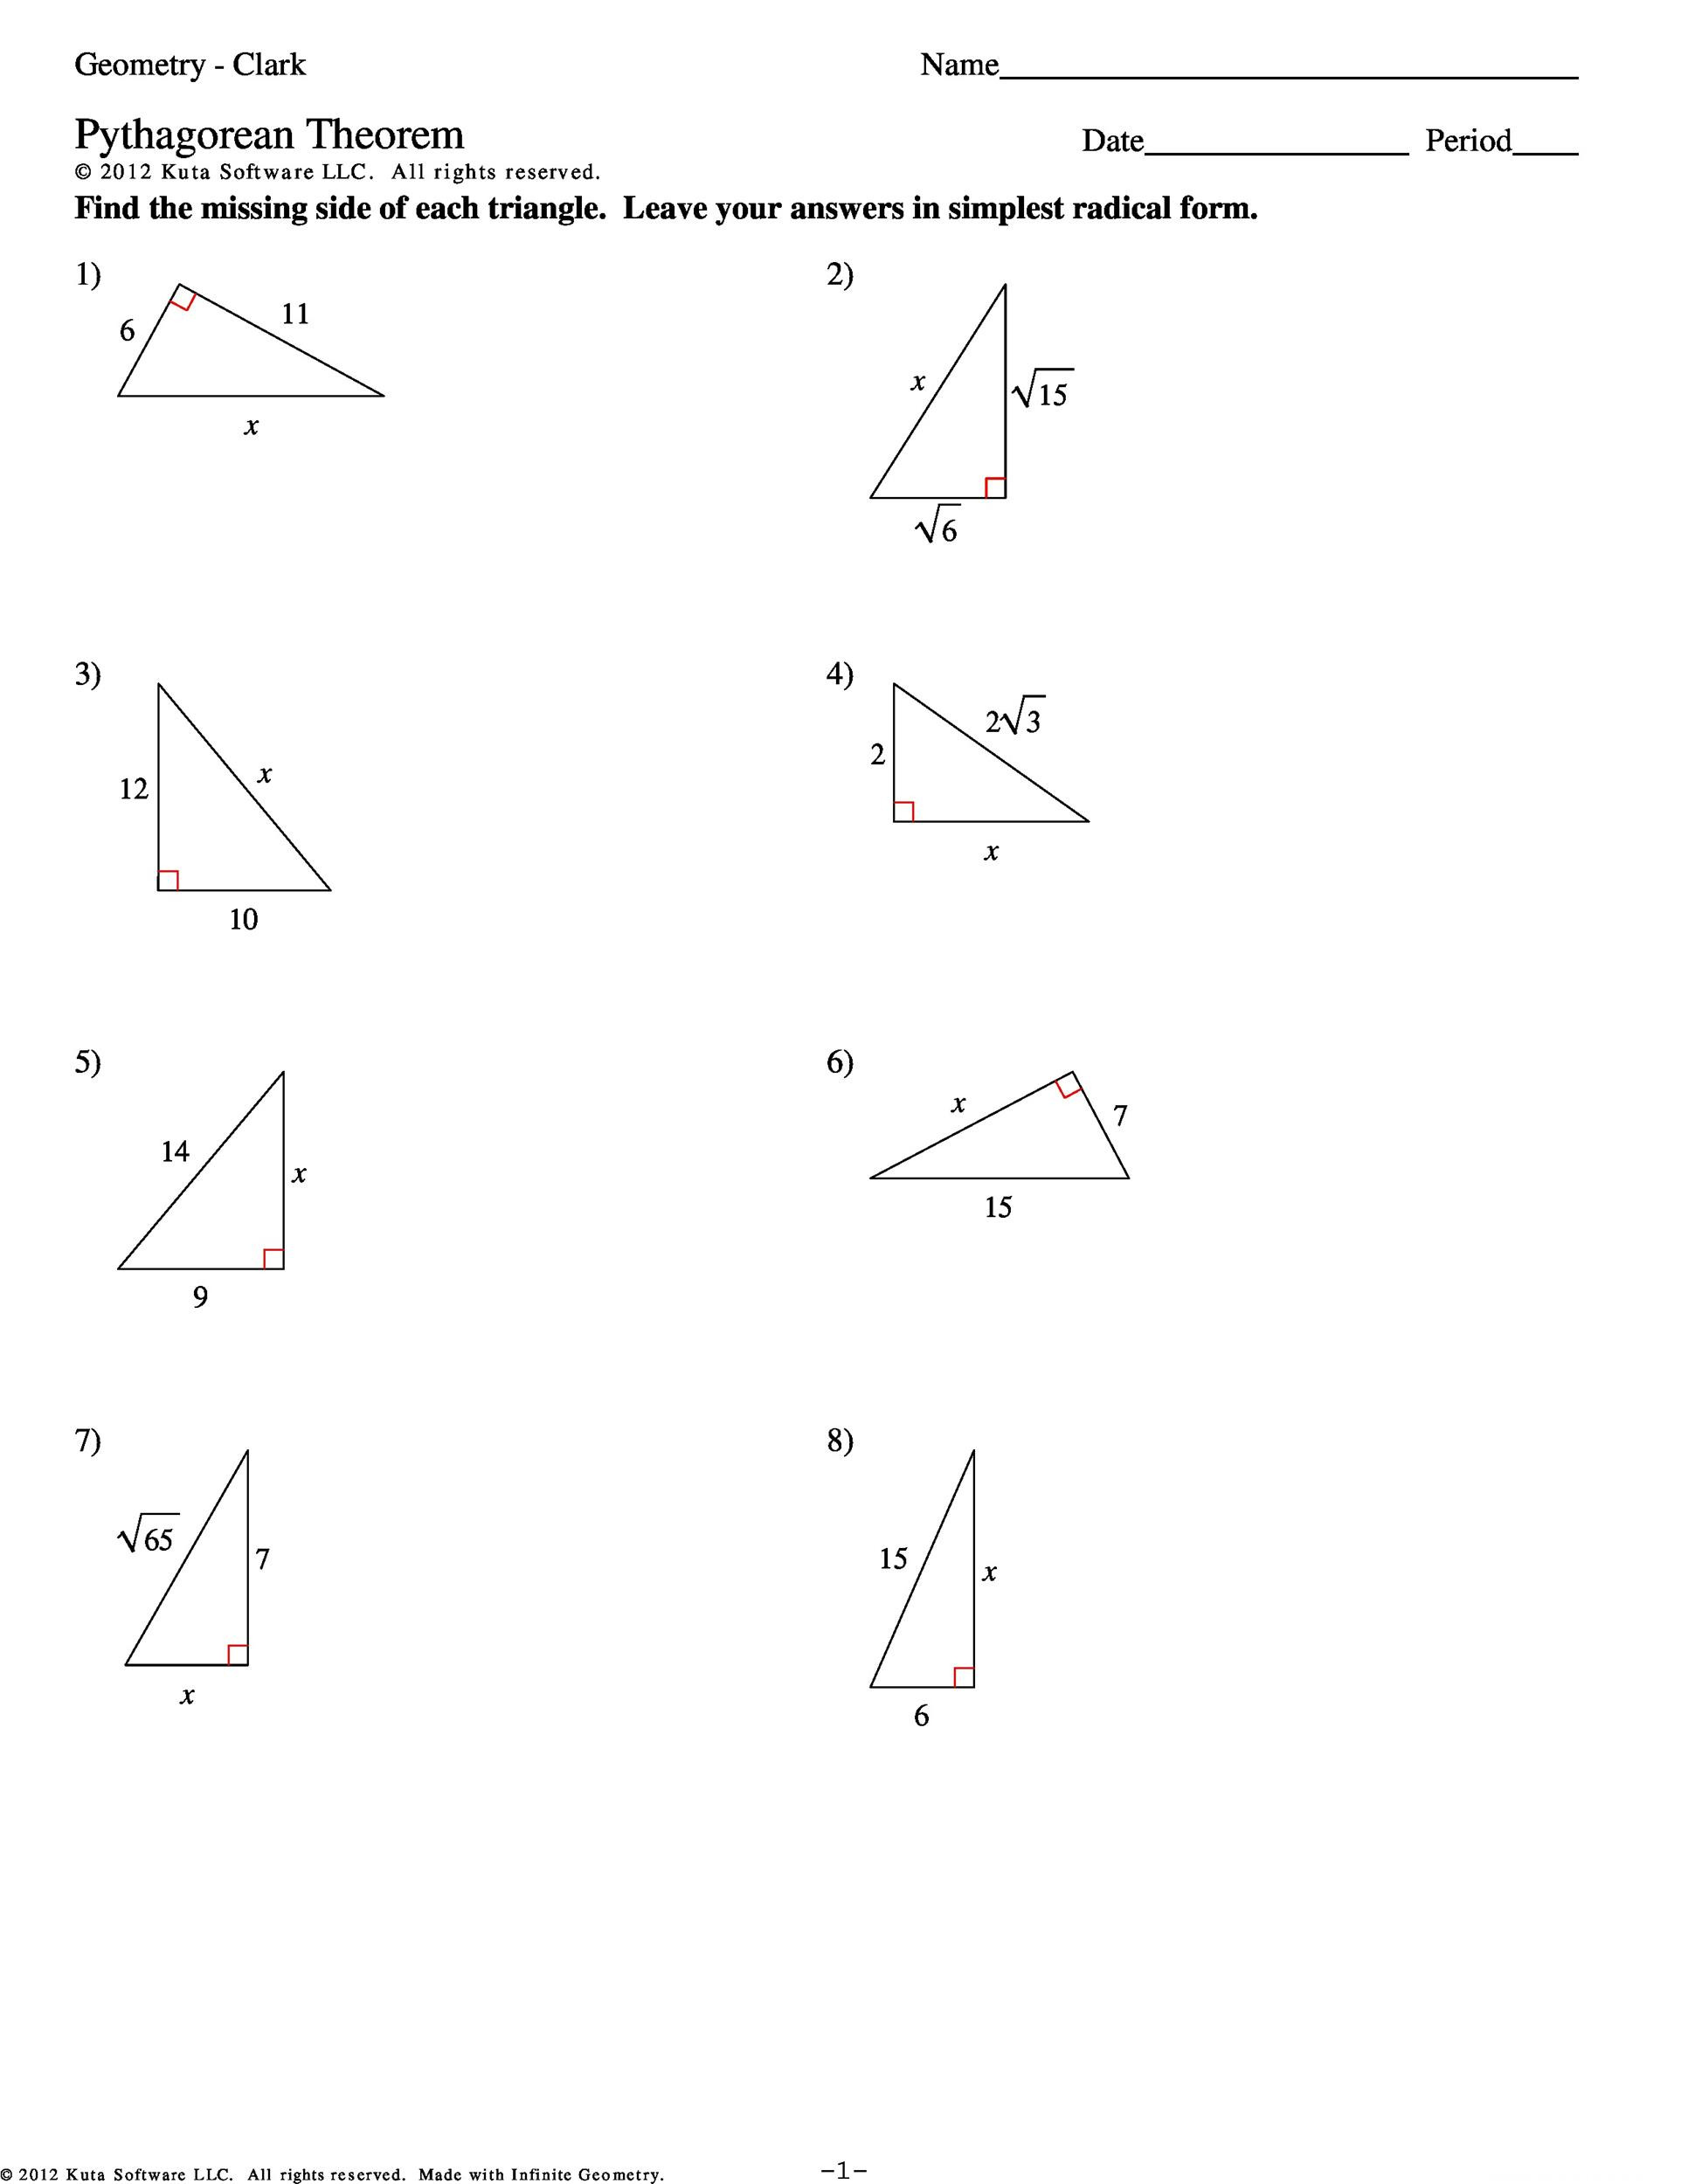 Pythagorean theorem Practice Worksheet 48 Pythagorean theorem Worksheet with Answers [word Pdf]